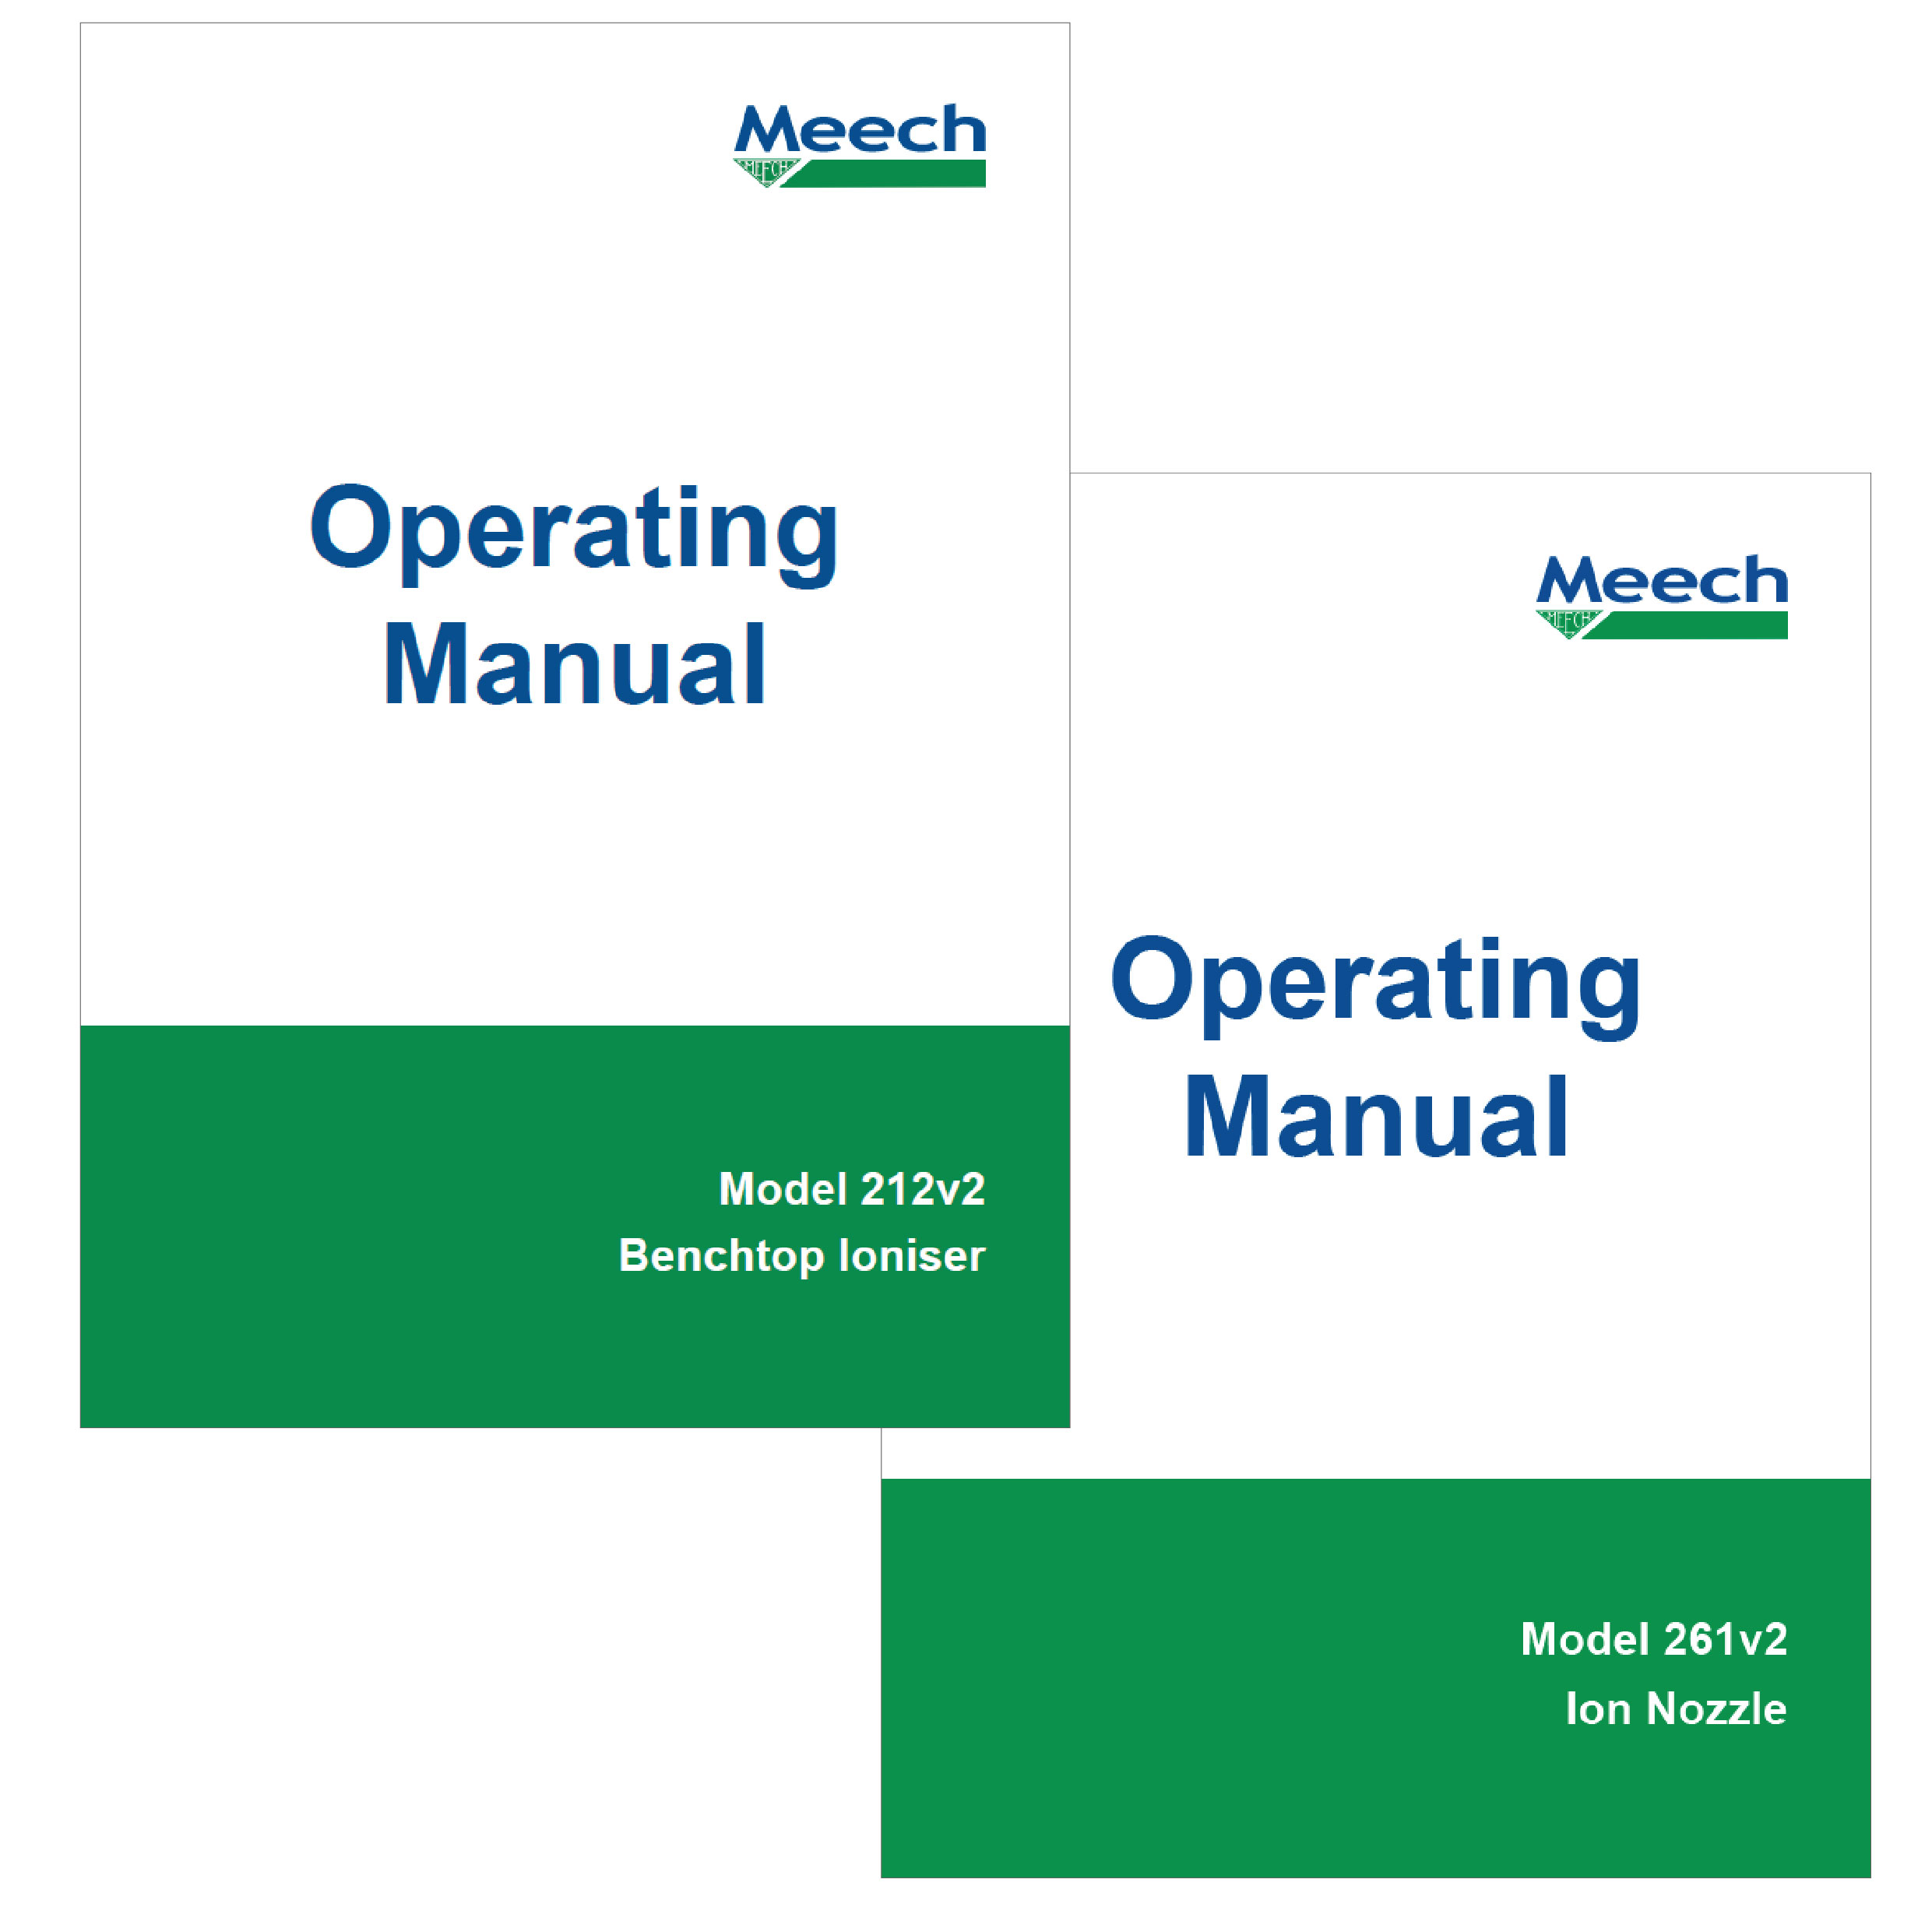 200 Series Operating Manuals